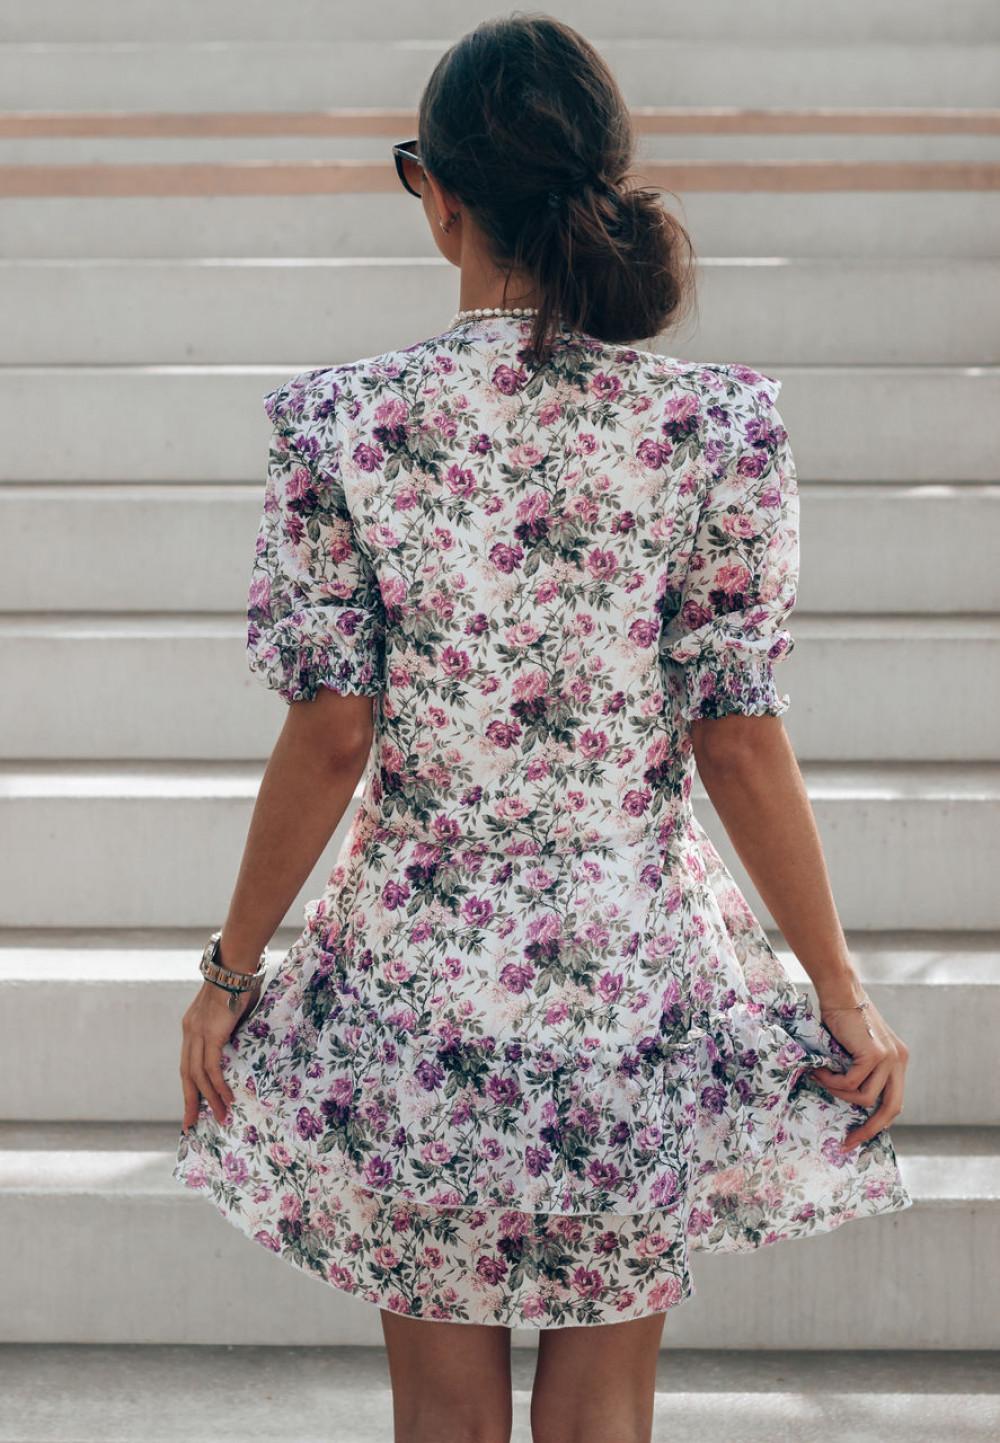 Fioletowa kwiatowa rozkloszowana sukienka V-Neck Caterina 3